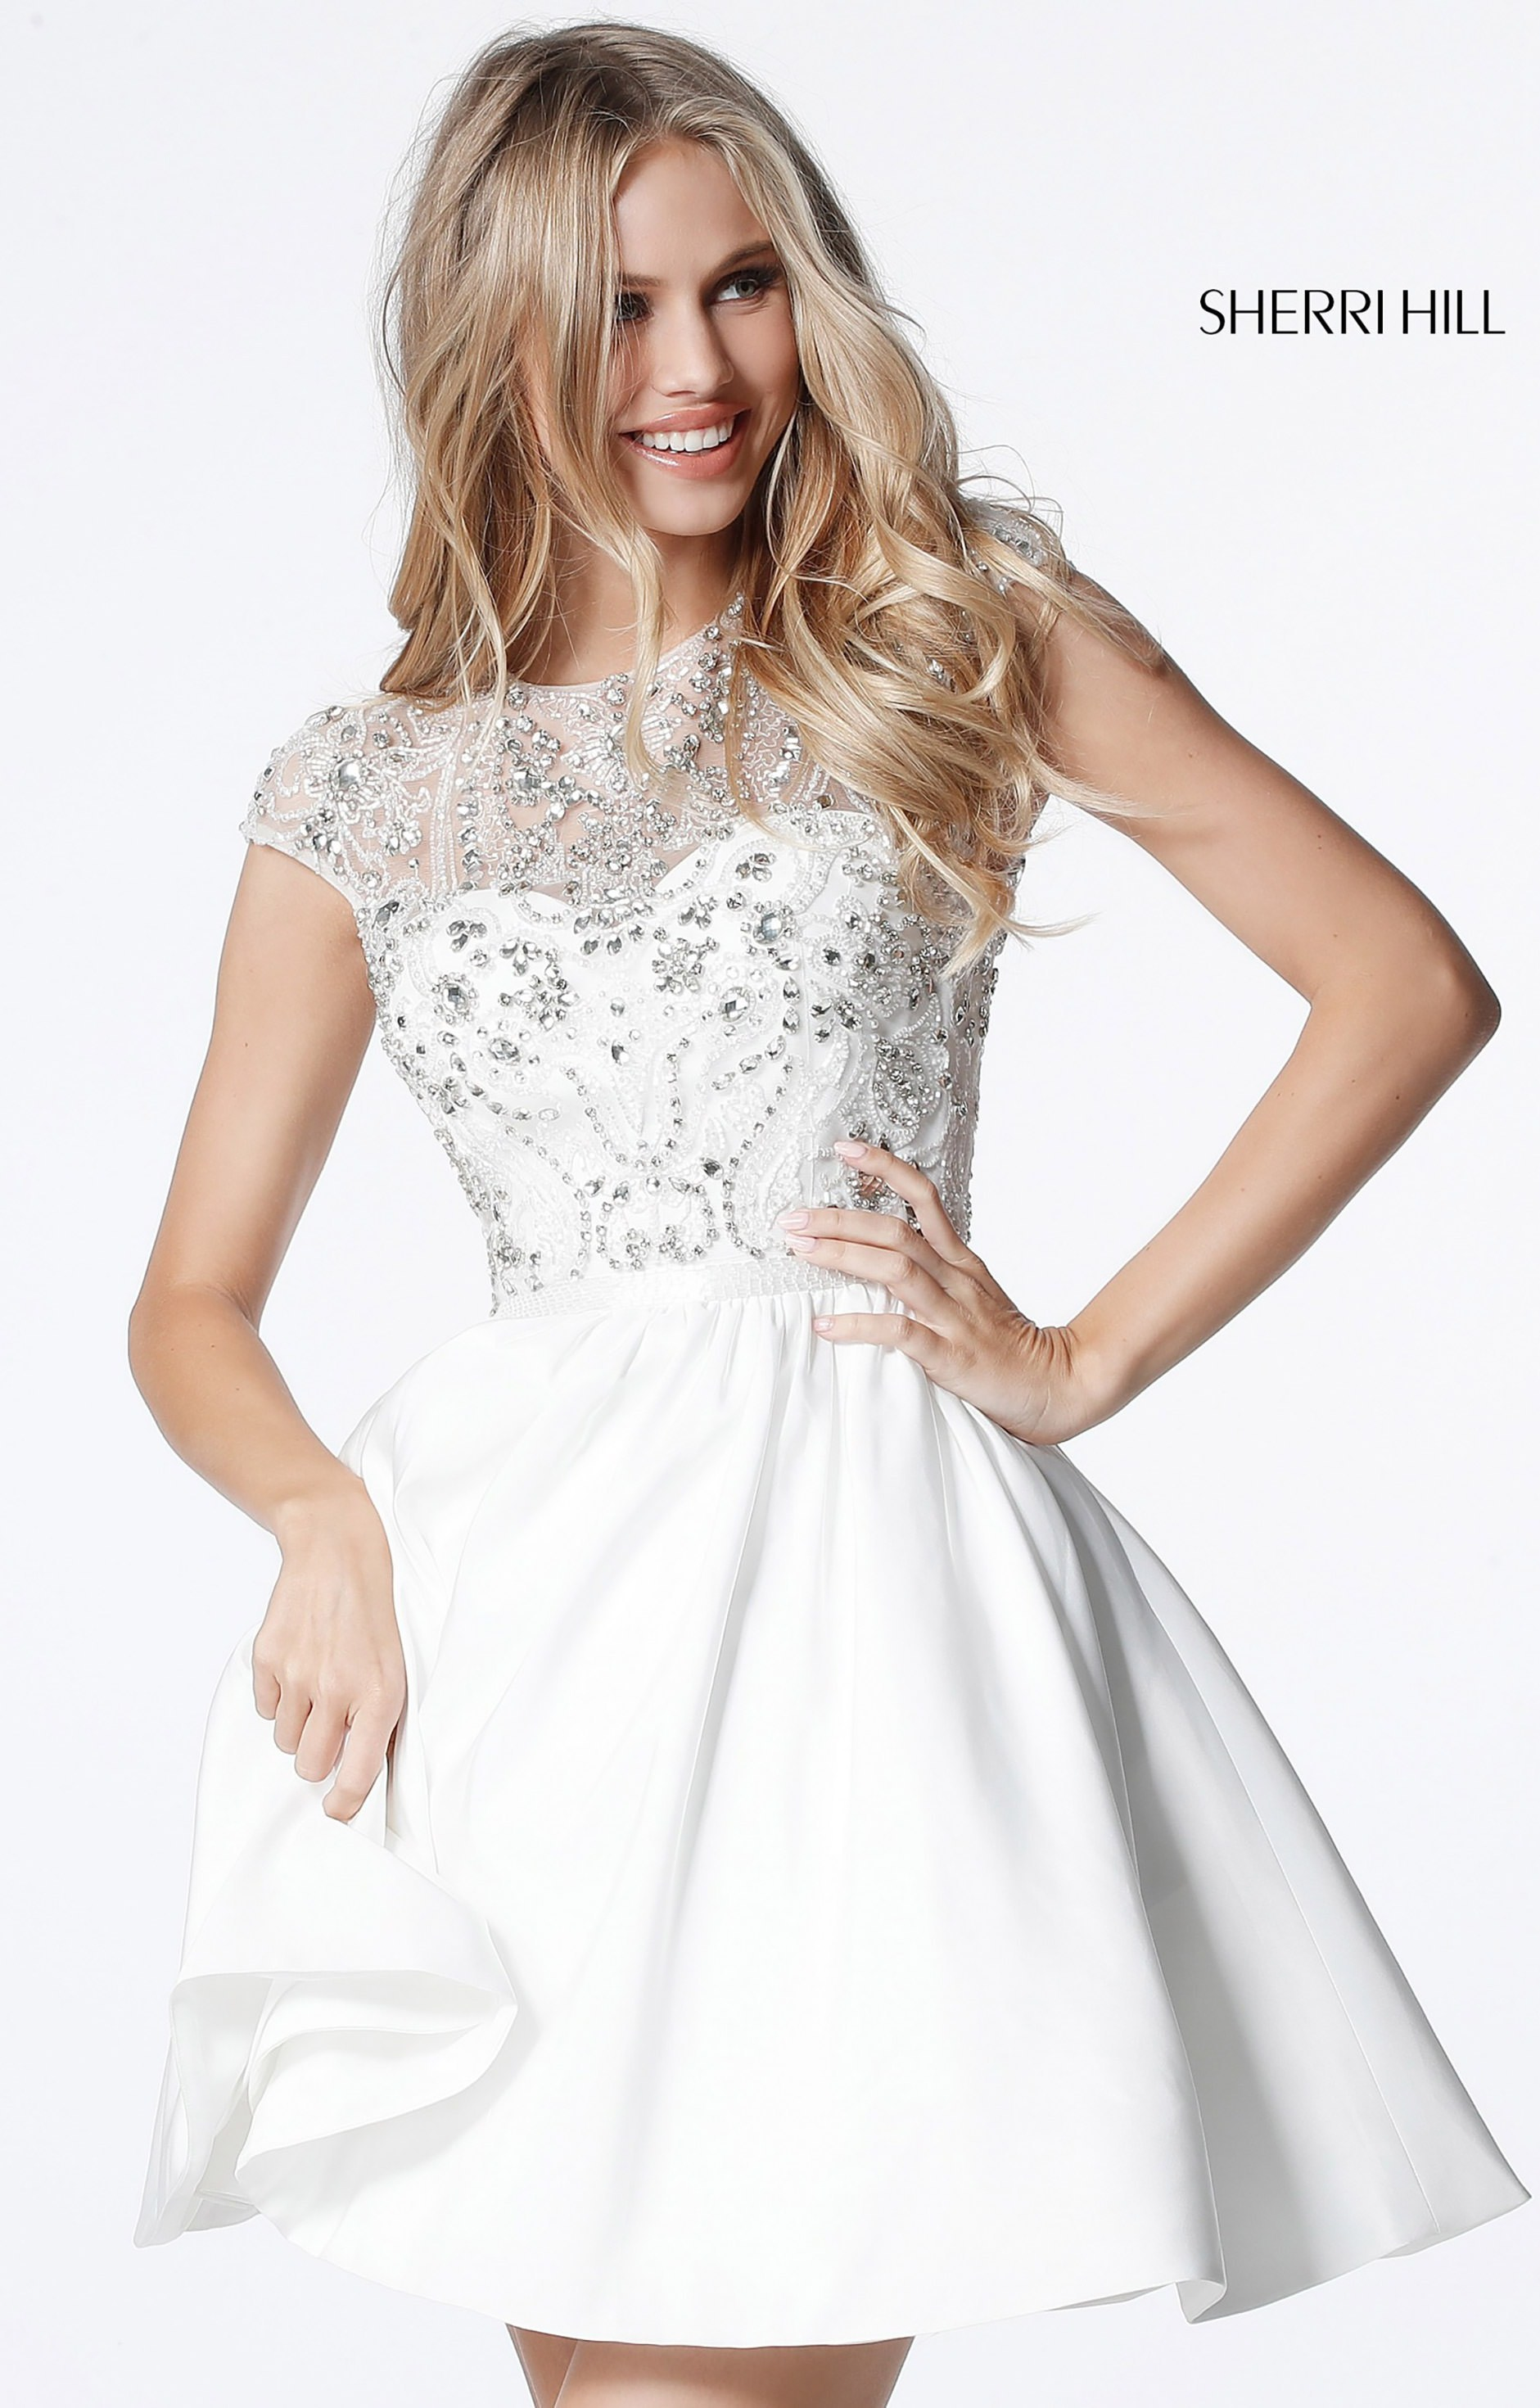 bfceb014212 Sherri Hill 51515 - Short Cap Sleeve A-Line Taffeta Prom Dress